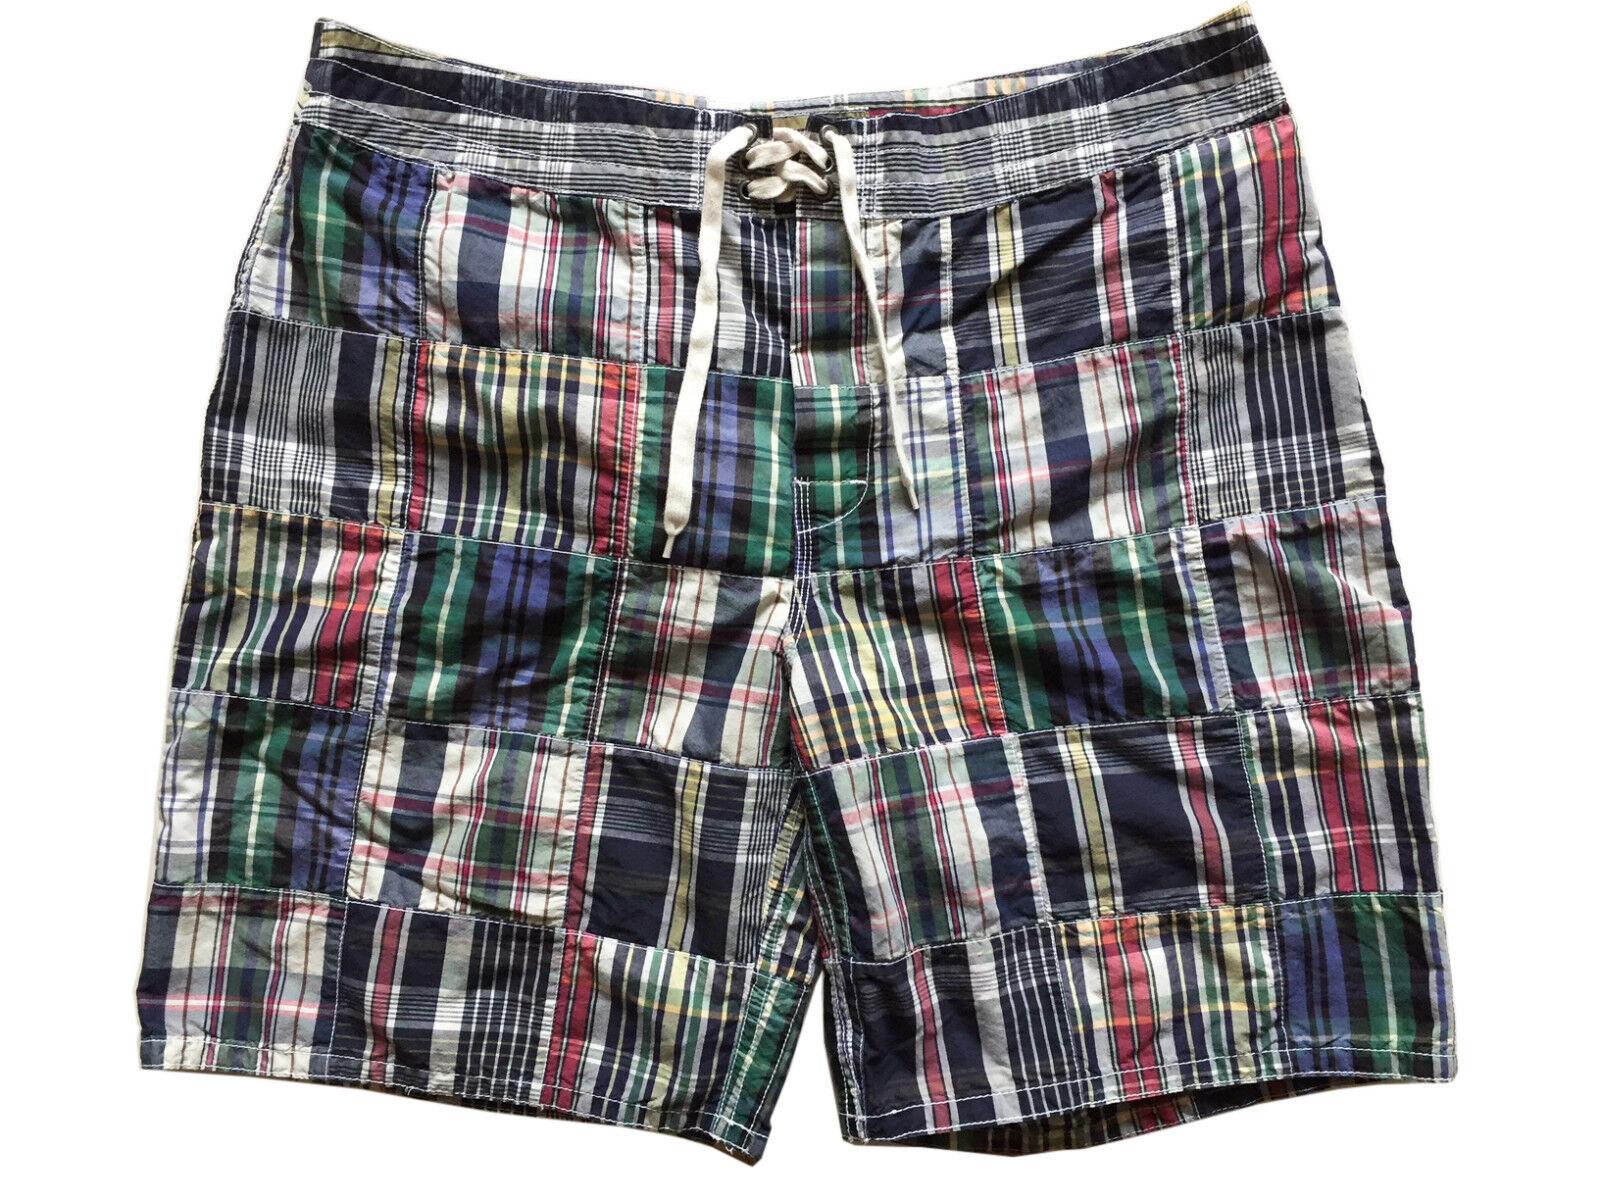 Size 42 Bnwt Dsquared2 Slim Jean Shorts Rrp 449 Euro r30